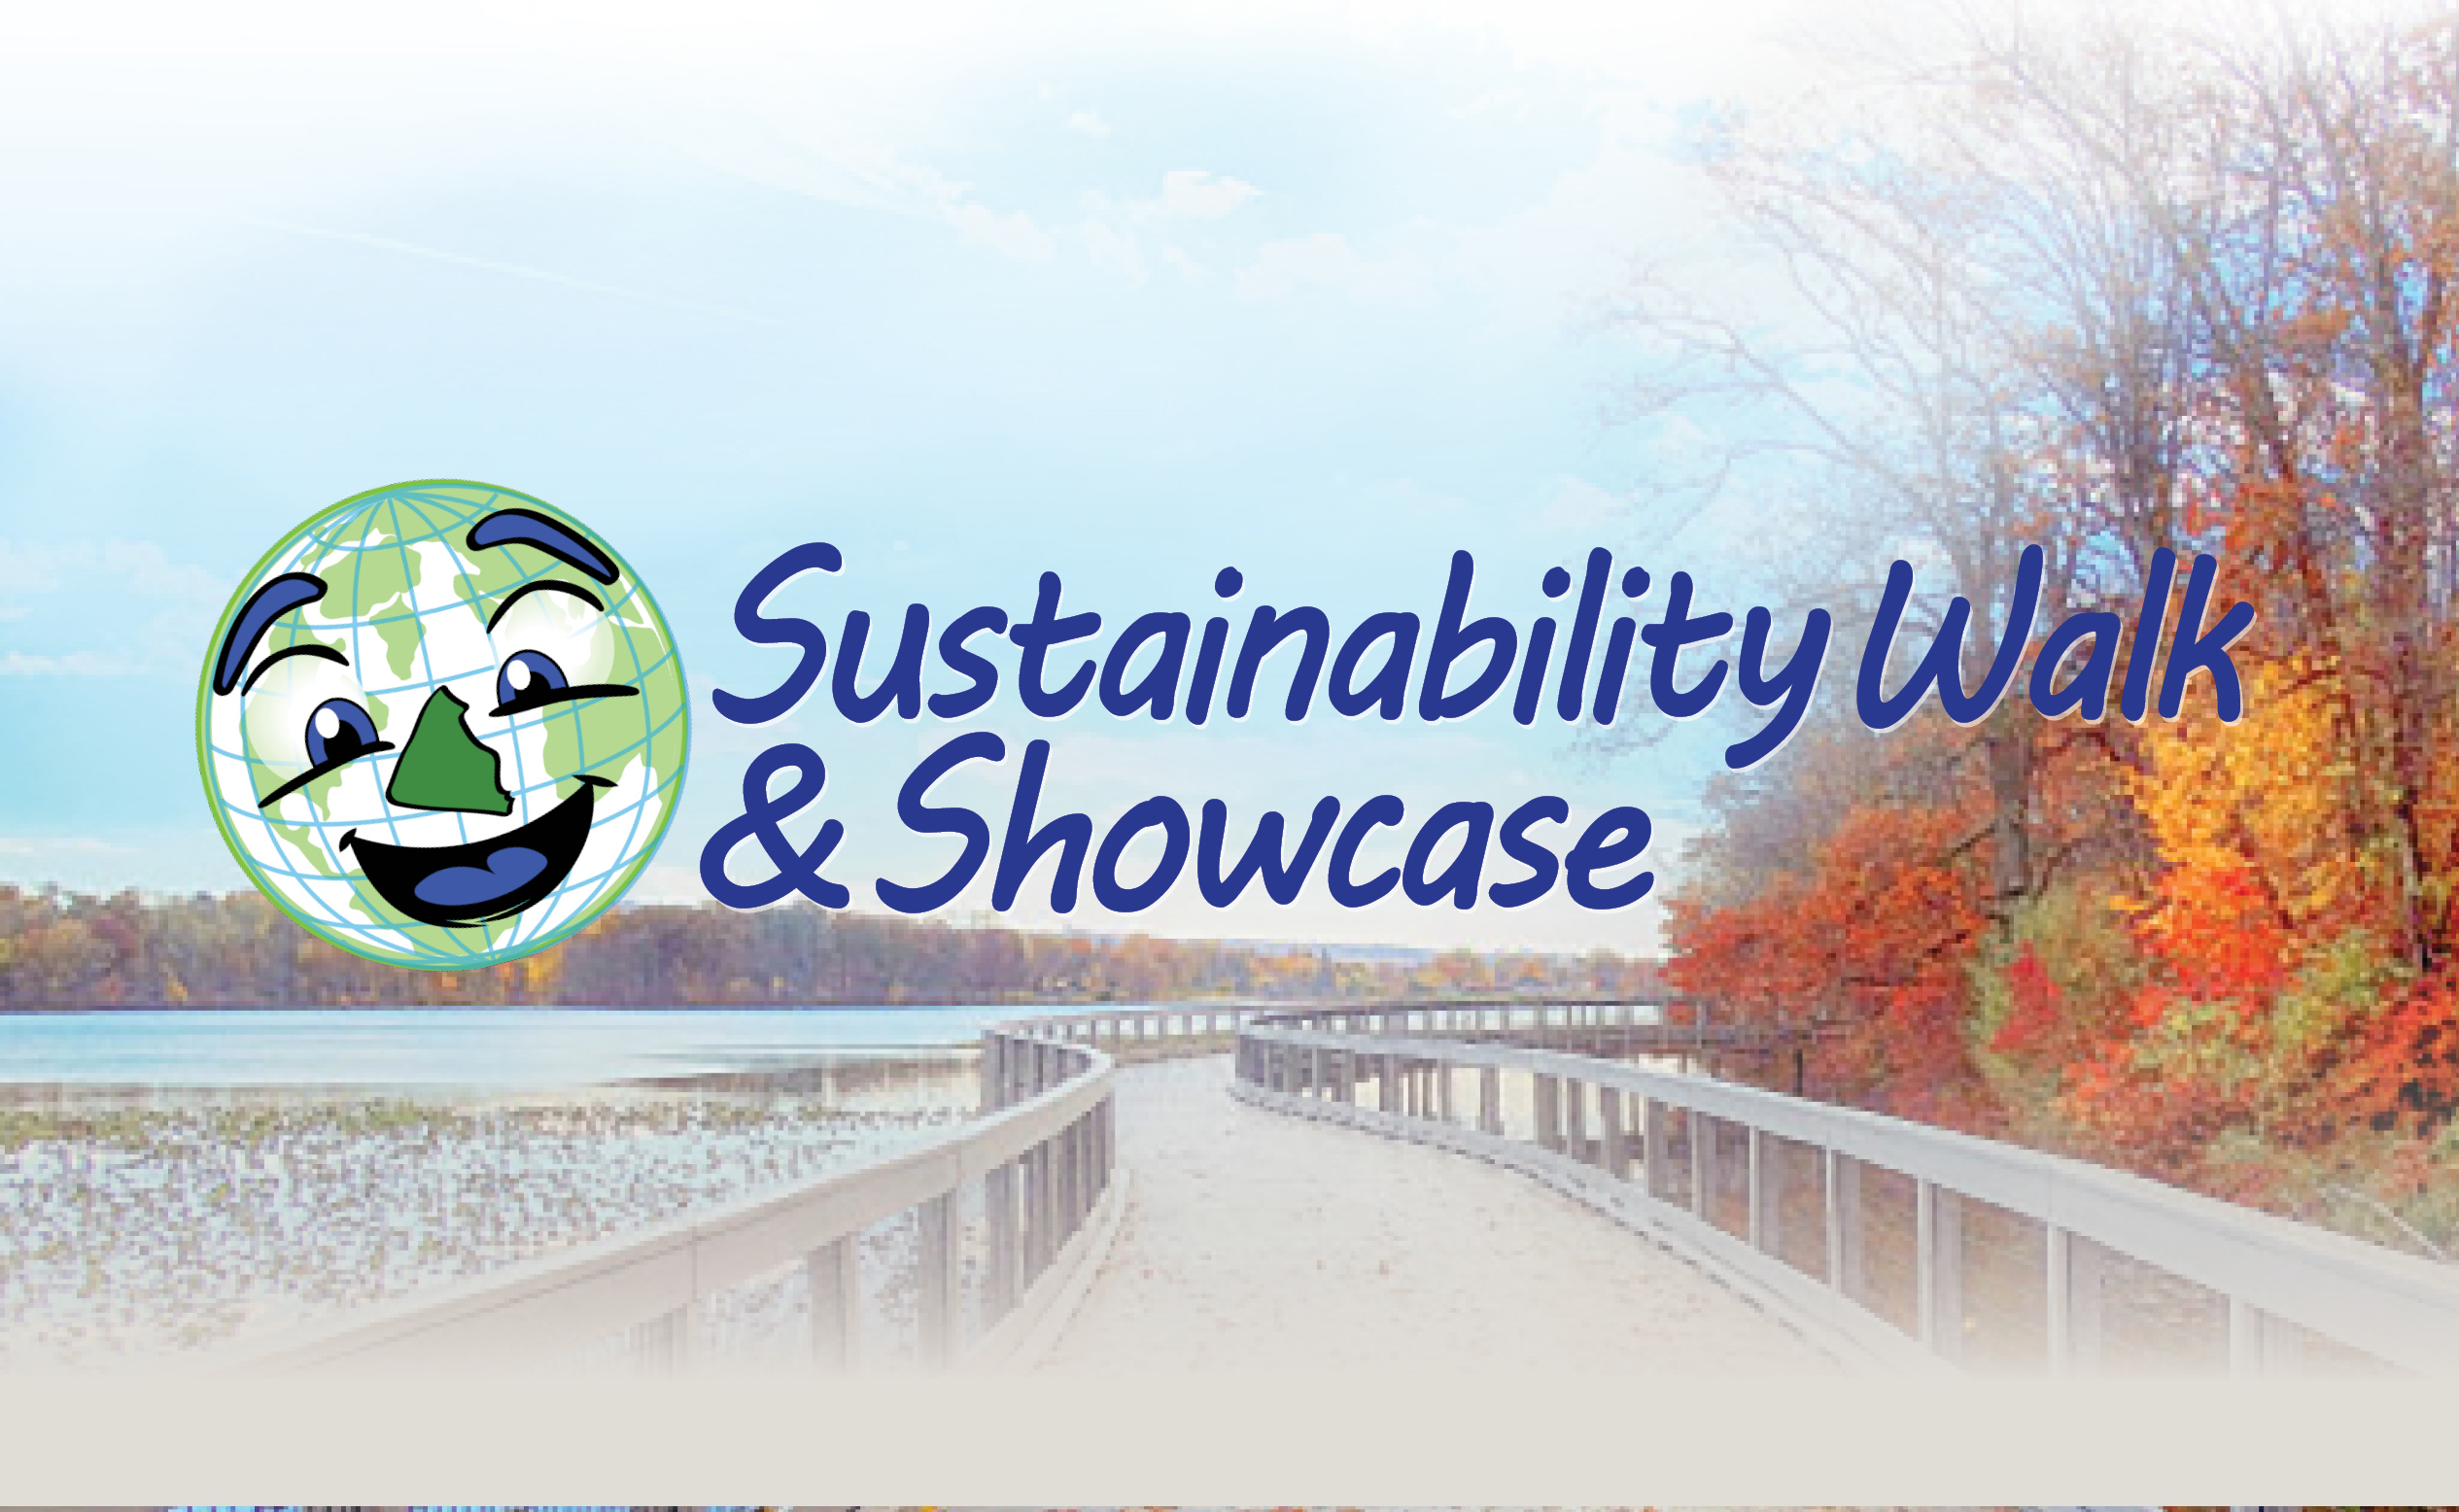 Sustainability Walk & Showcase Fundraiser at Congers Lake Memorial Park